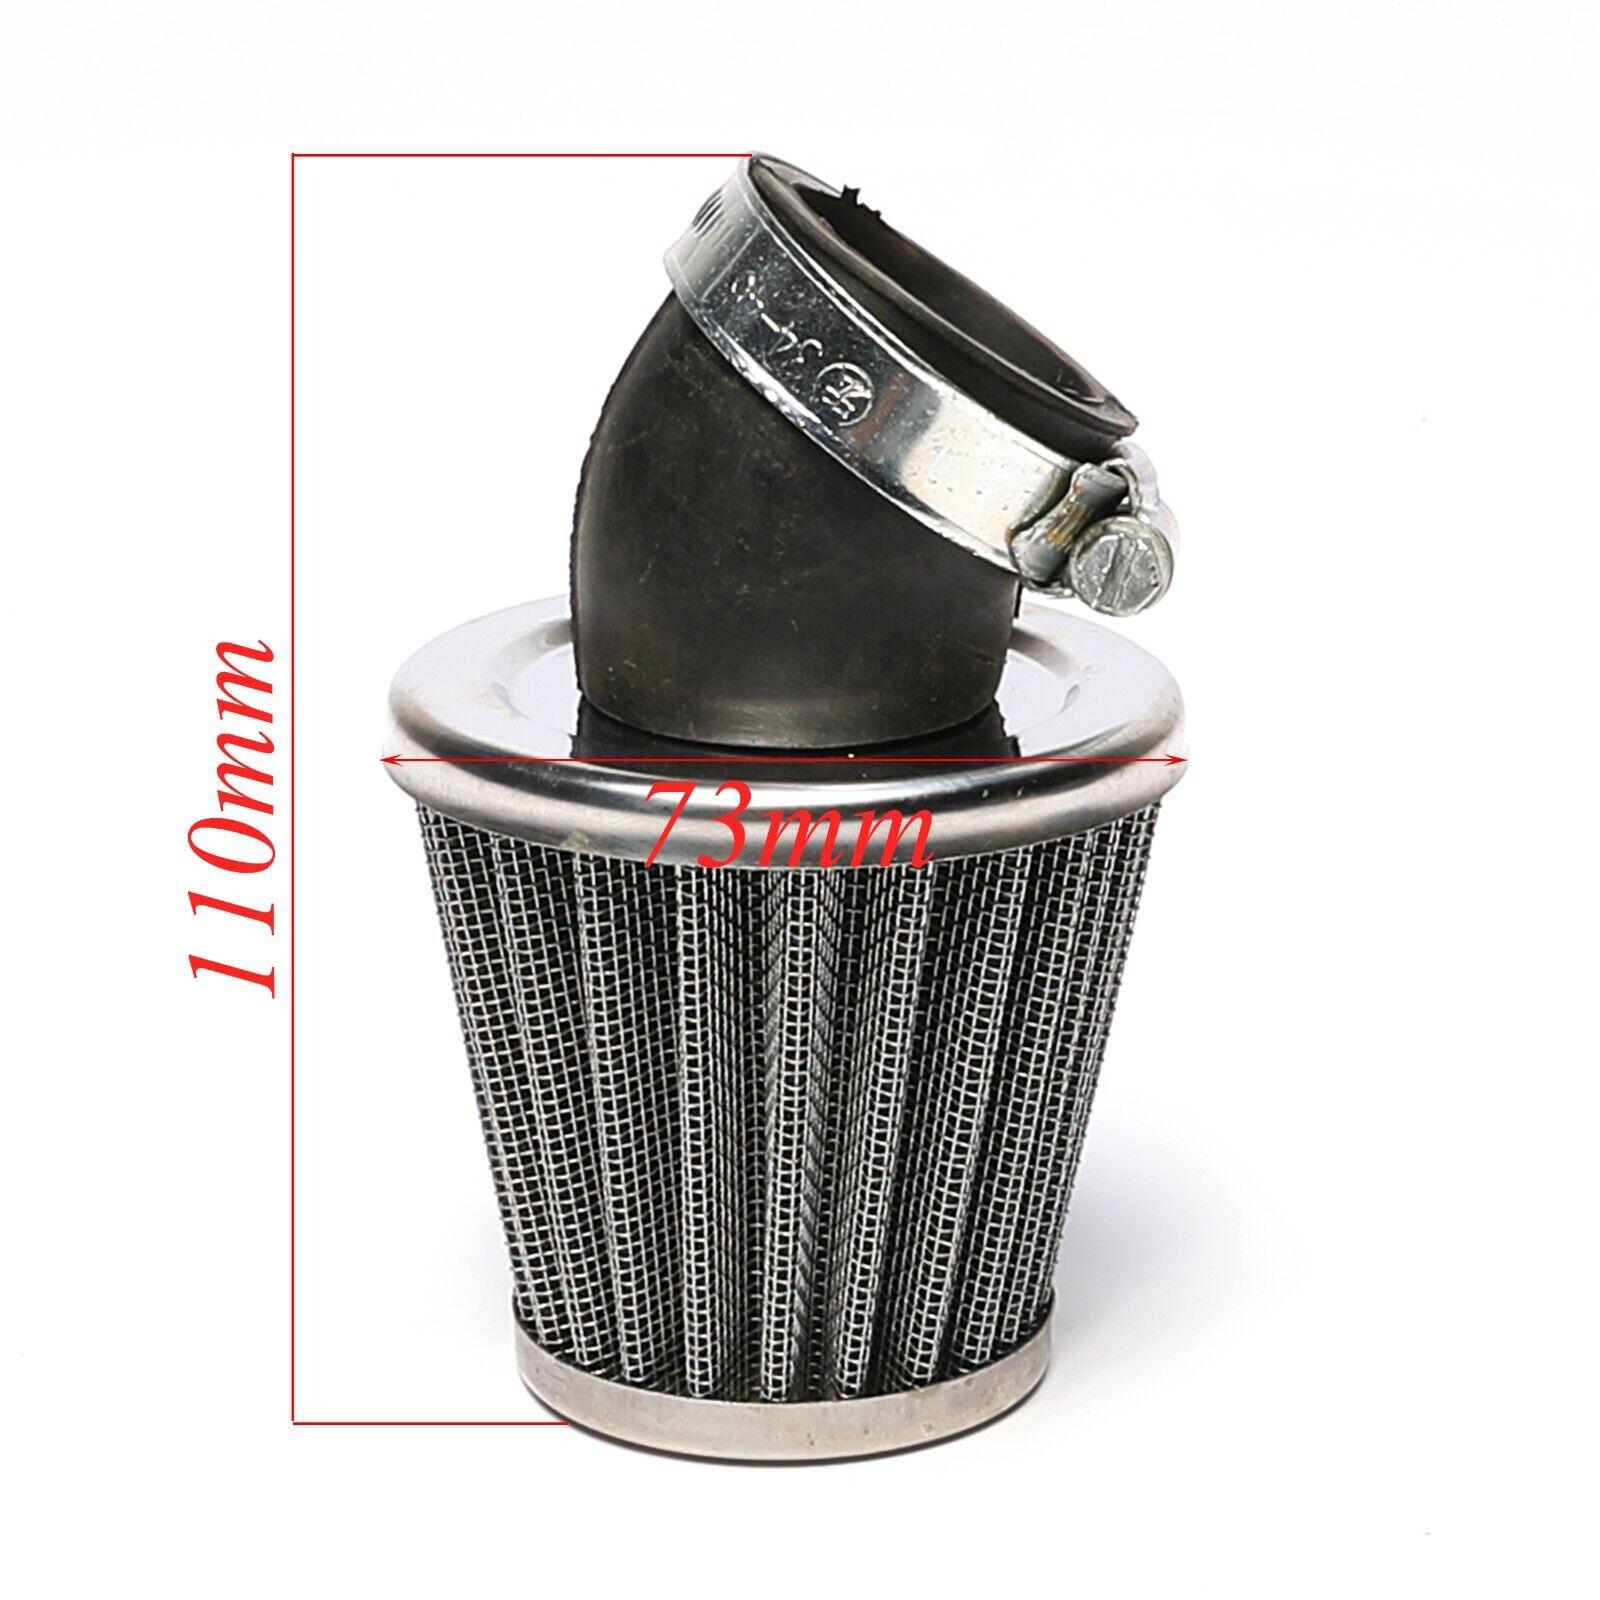 Air Filter 35mm For Atv 50cc 70 90 110cc Dirt Bike Go Kart